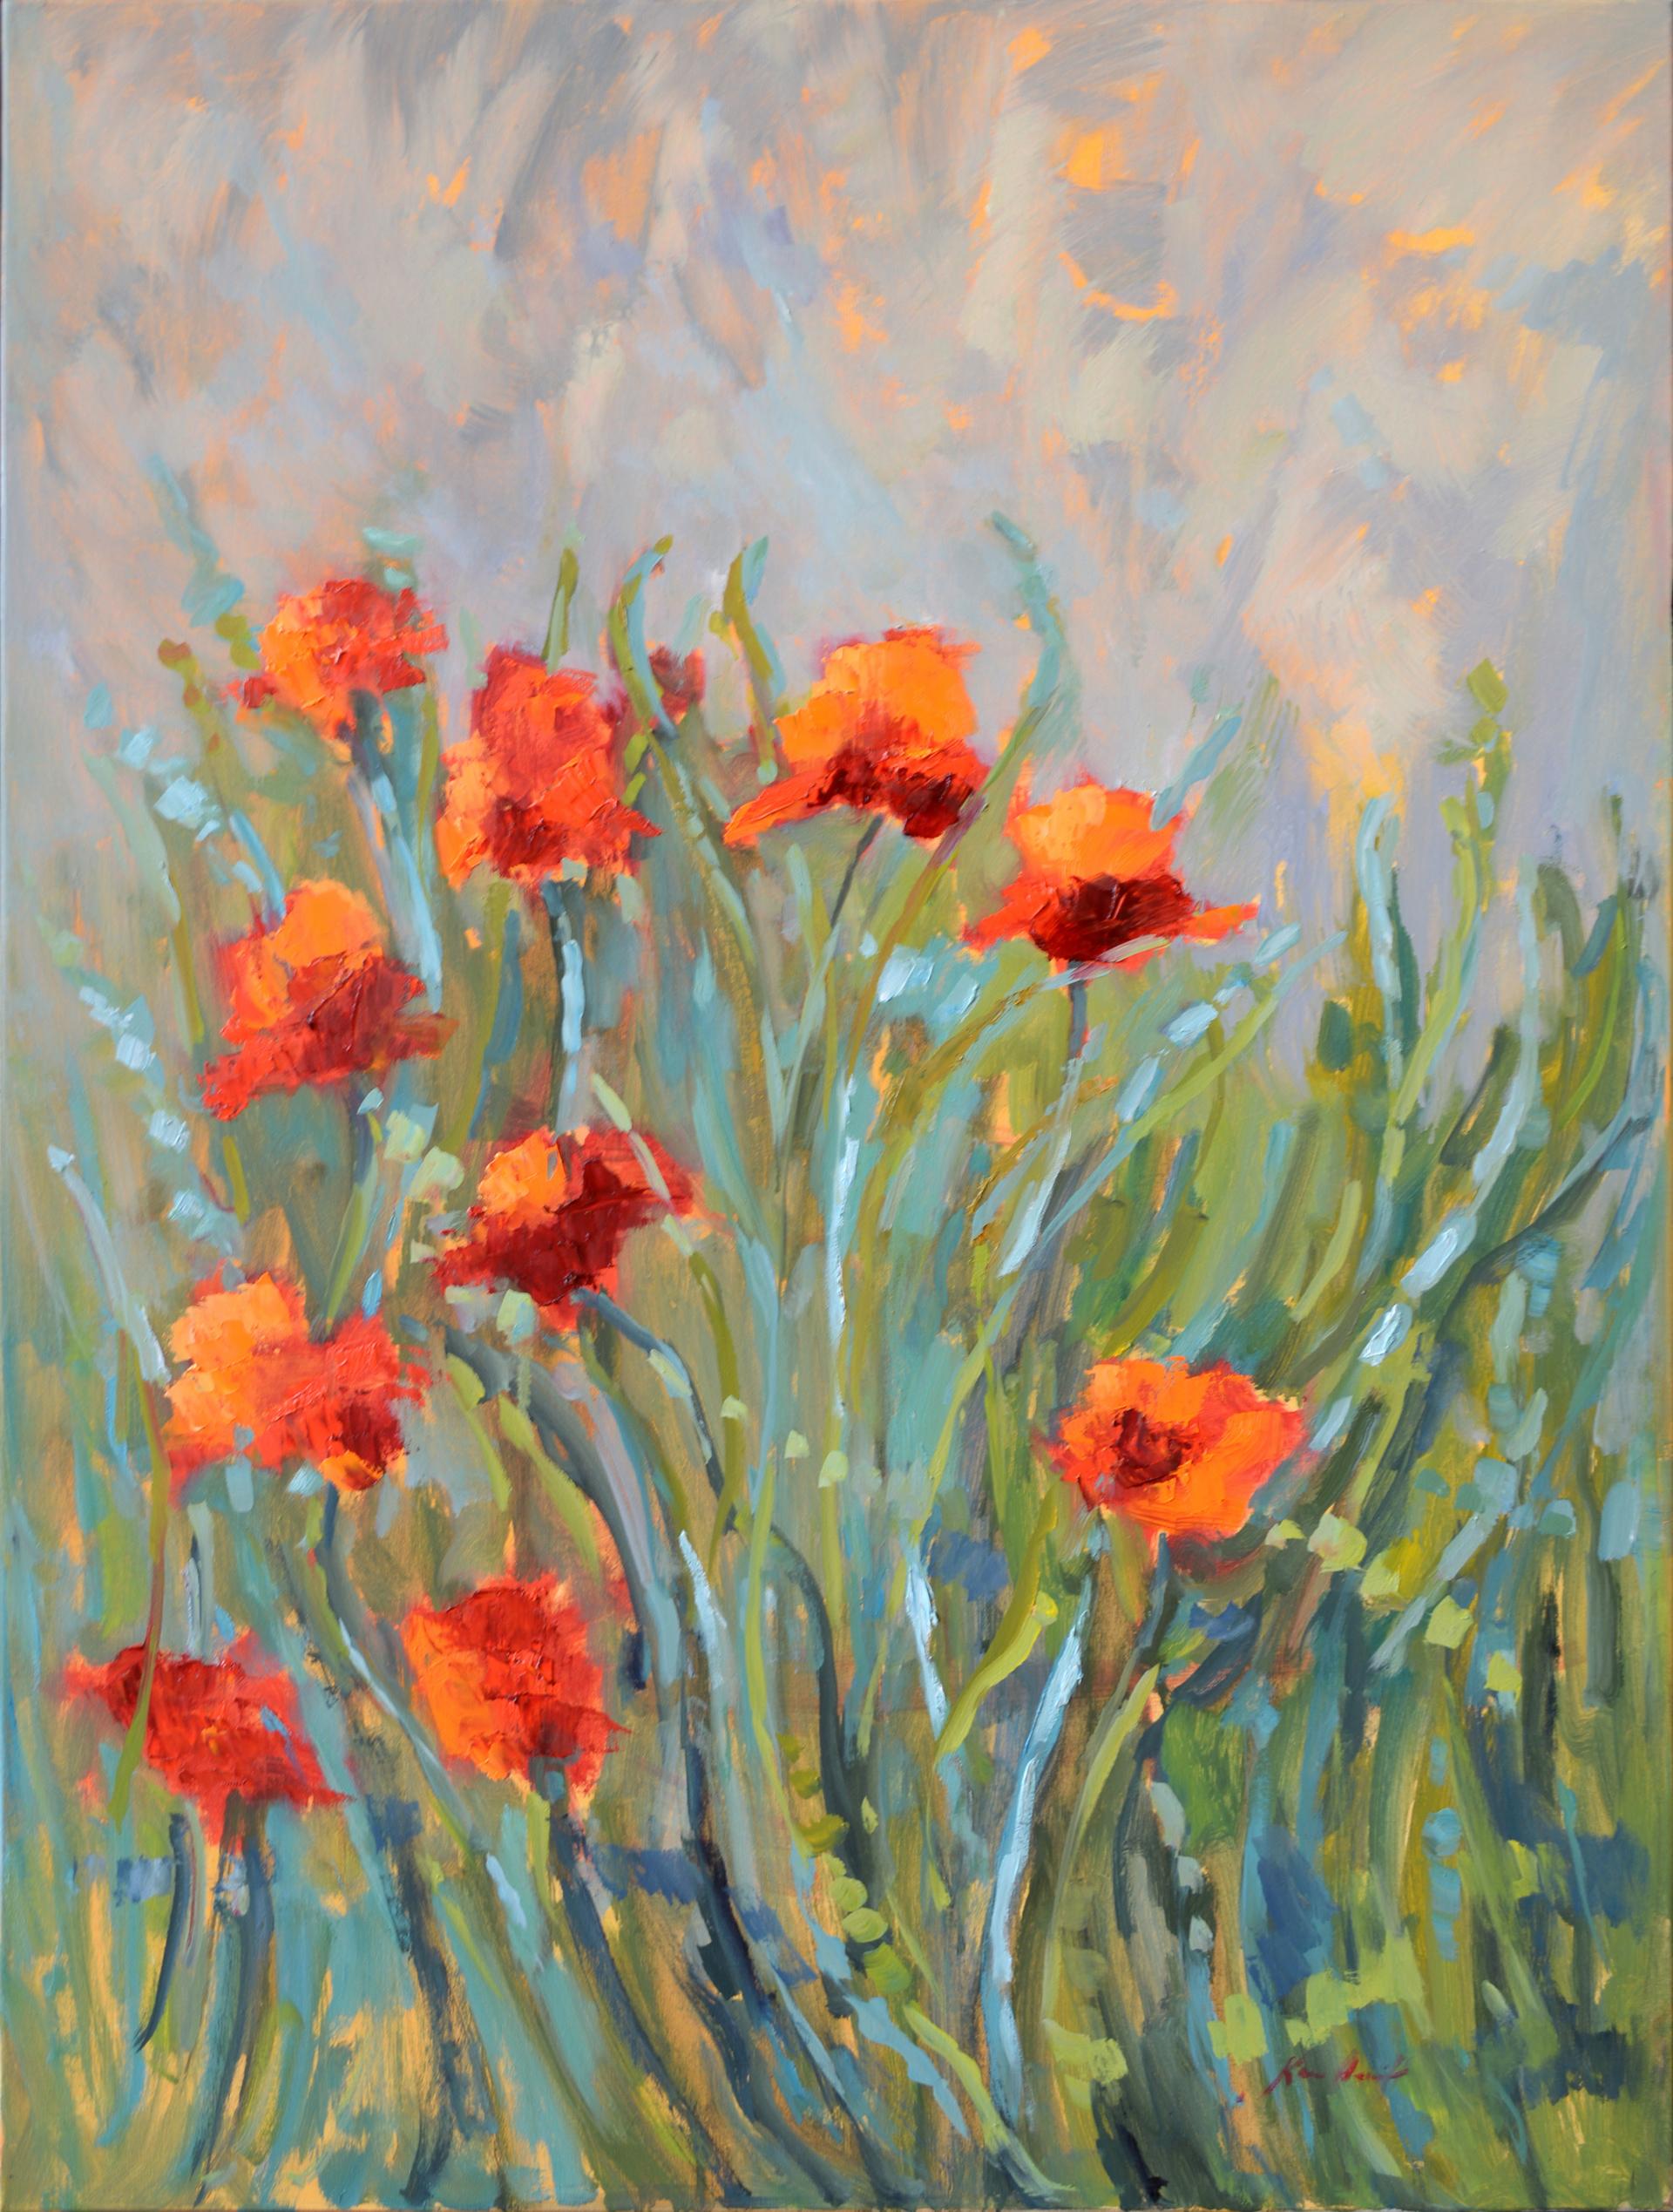 Windy Day in the Poppy Field by Karen Hewitt Hagan